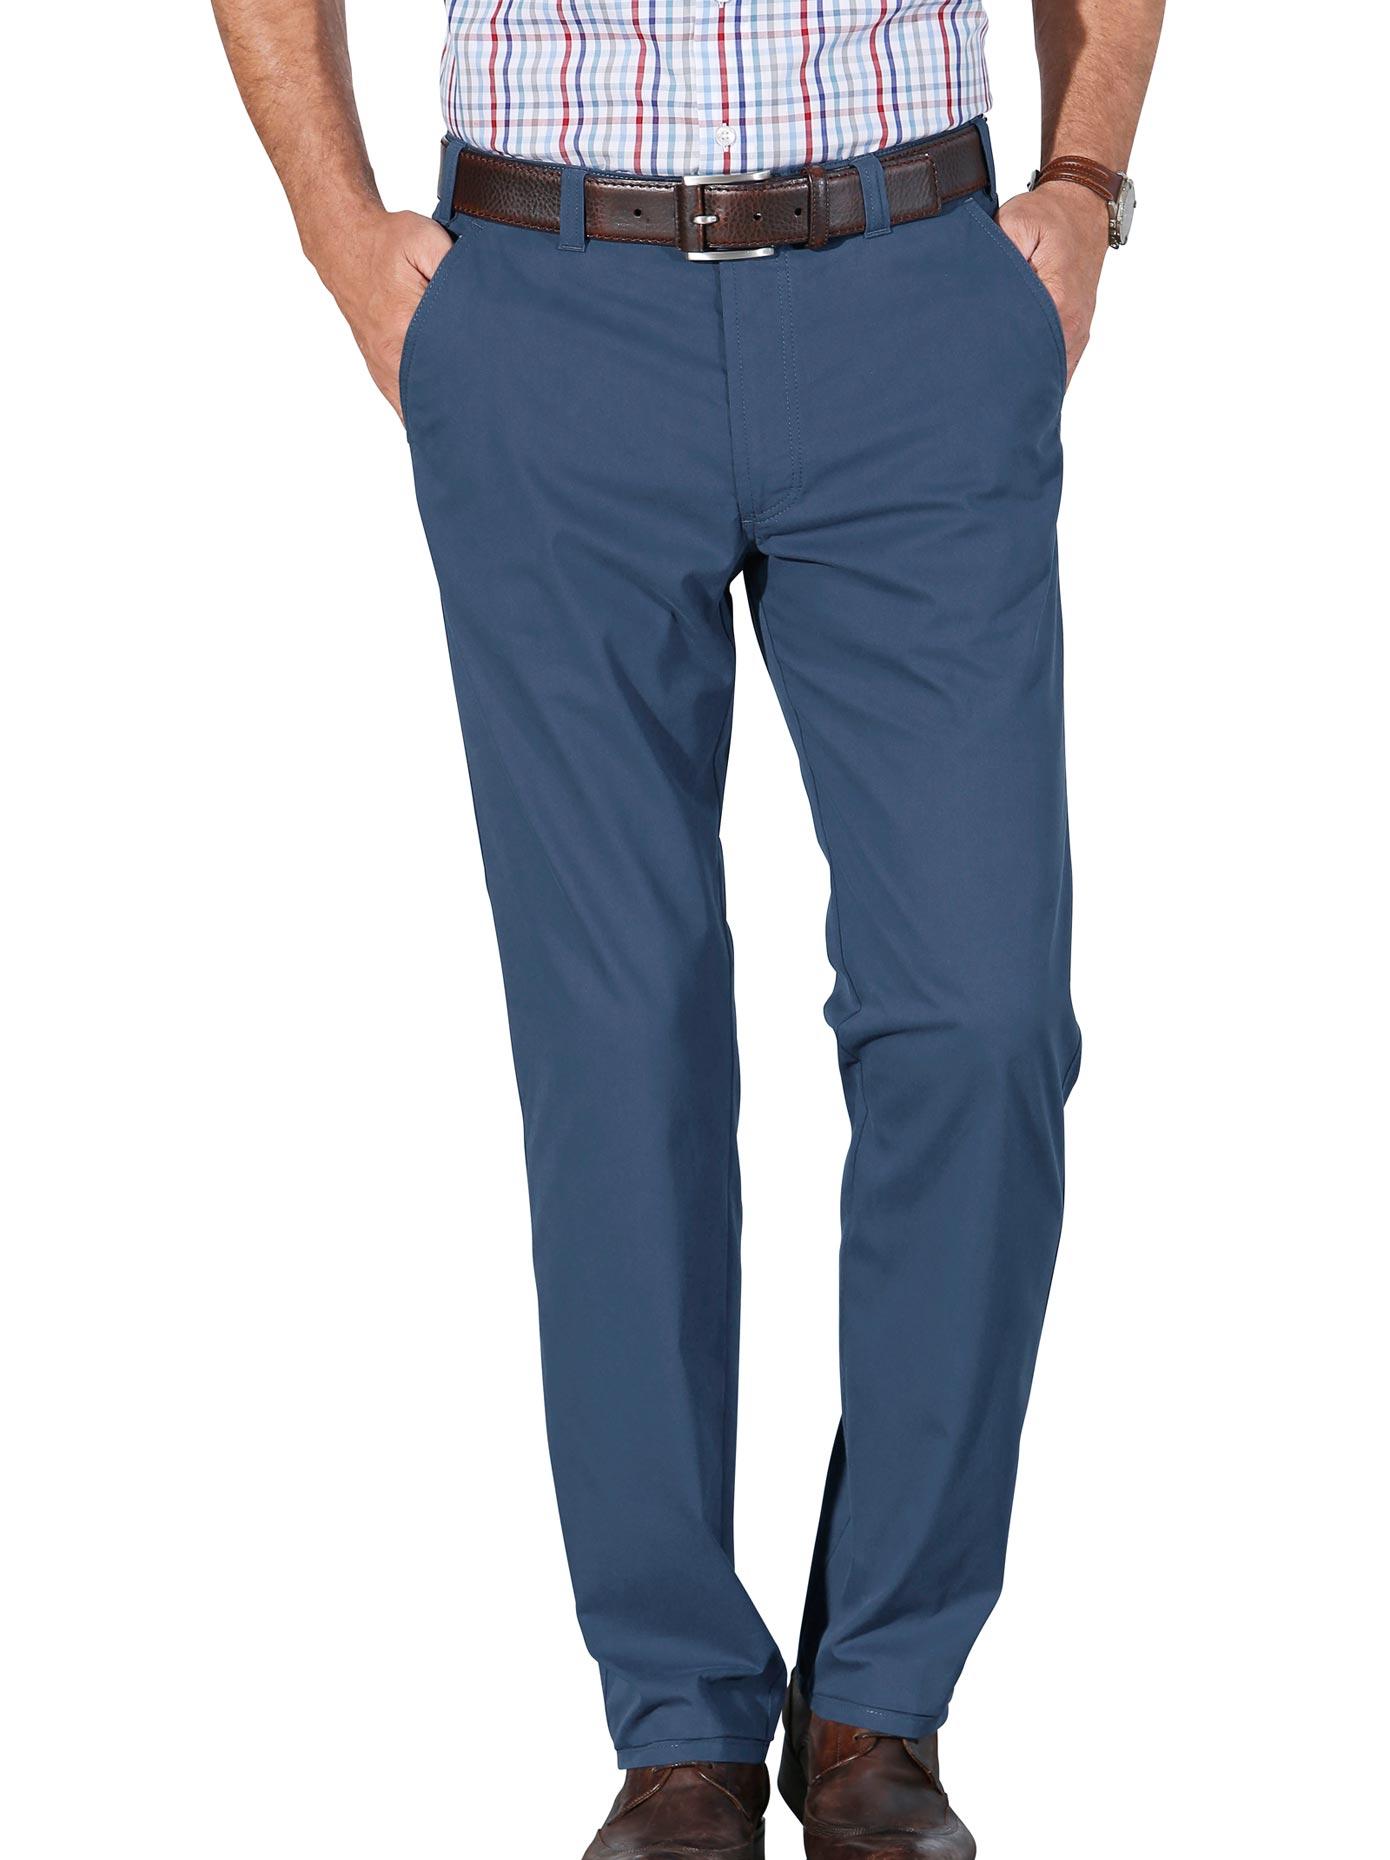 Brühl Hose in gepflegter leichter easy care-Qualität | Bekleidung > Hosen > Sonstige Hosen | Blau | Brühl